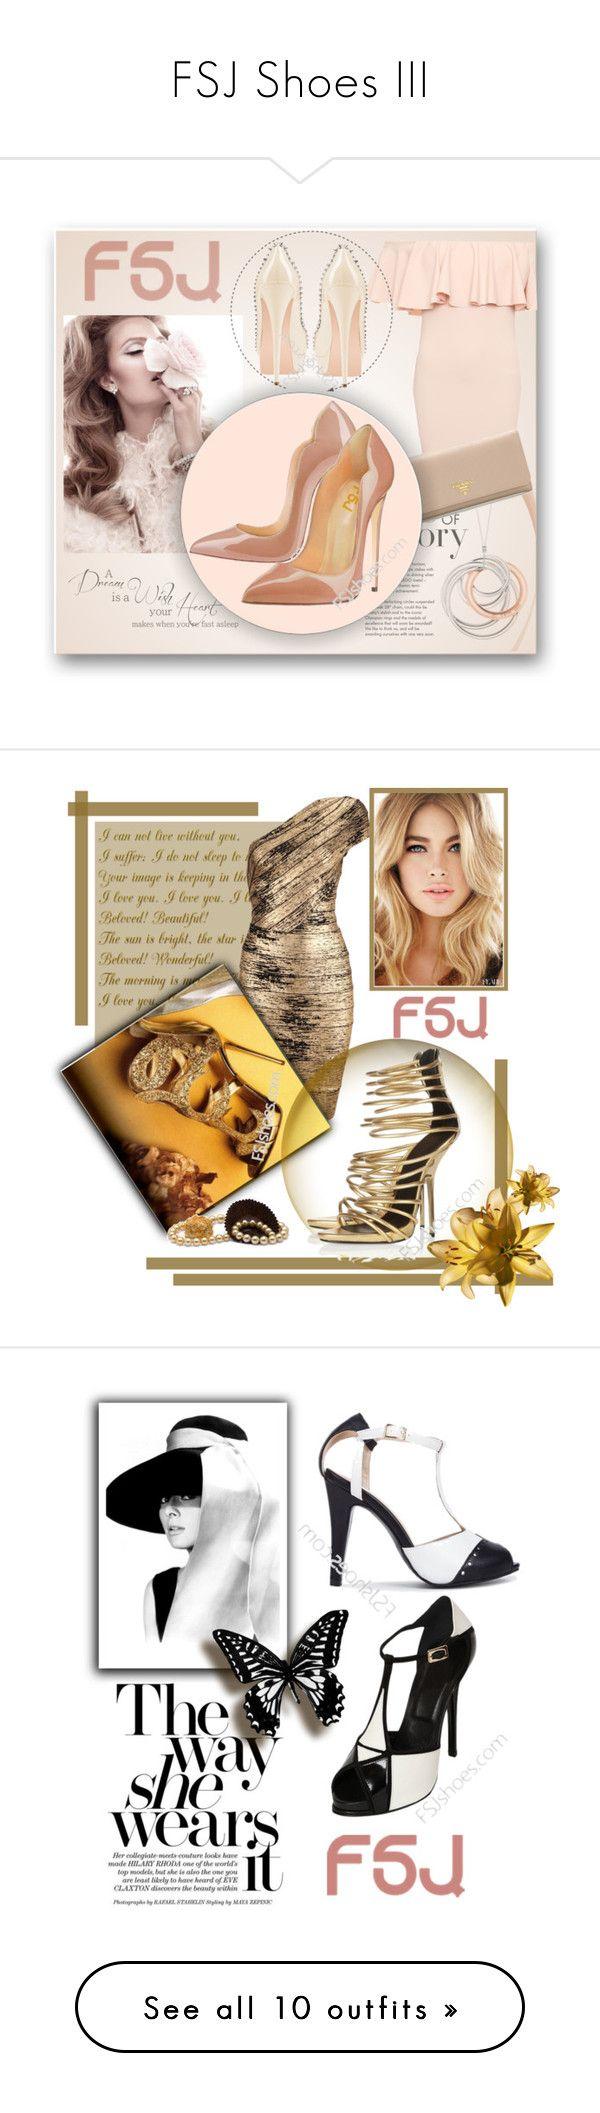 """FSJ Shoes III"" by zeljanadusanic ❤ liked on Polyvore featuring fsjshoes, fsj, St. John, Tiffany & Co., WearAll, Prada, Adrianna Papell, Nicolas Jebran, STELLA McCARTNEY and Paperself"